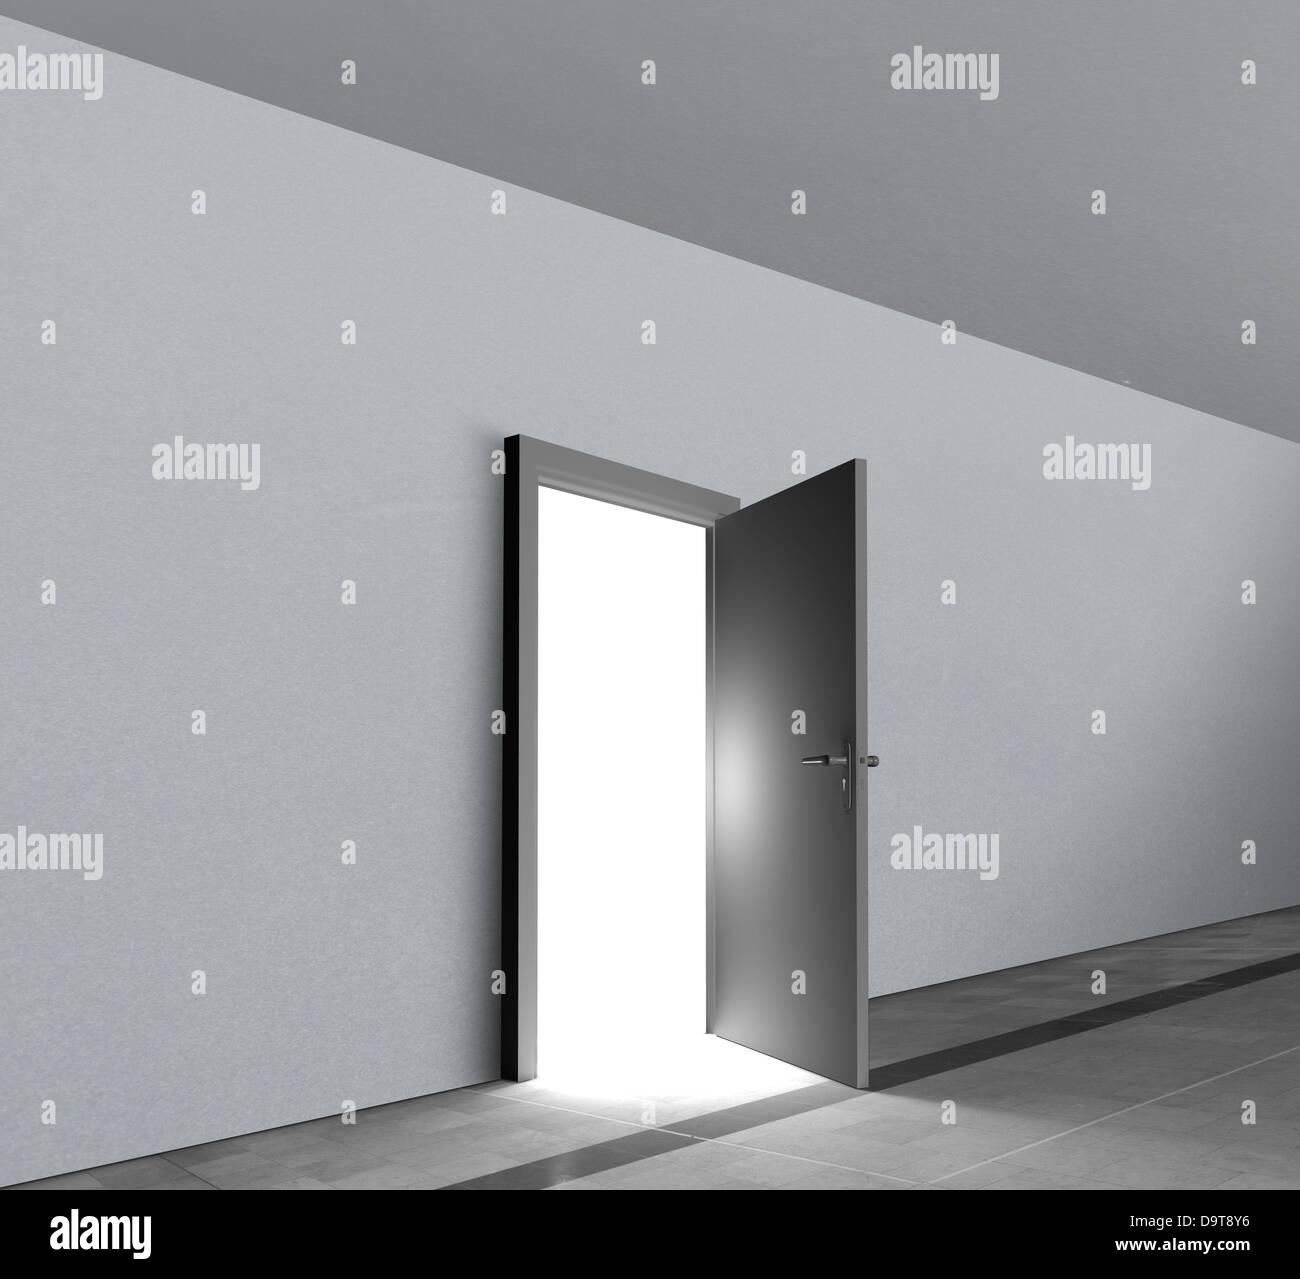 Door open showing bright white light shining - Stock Image